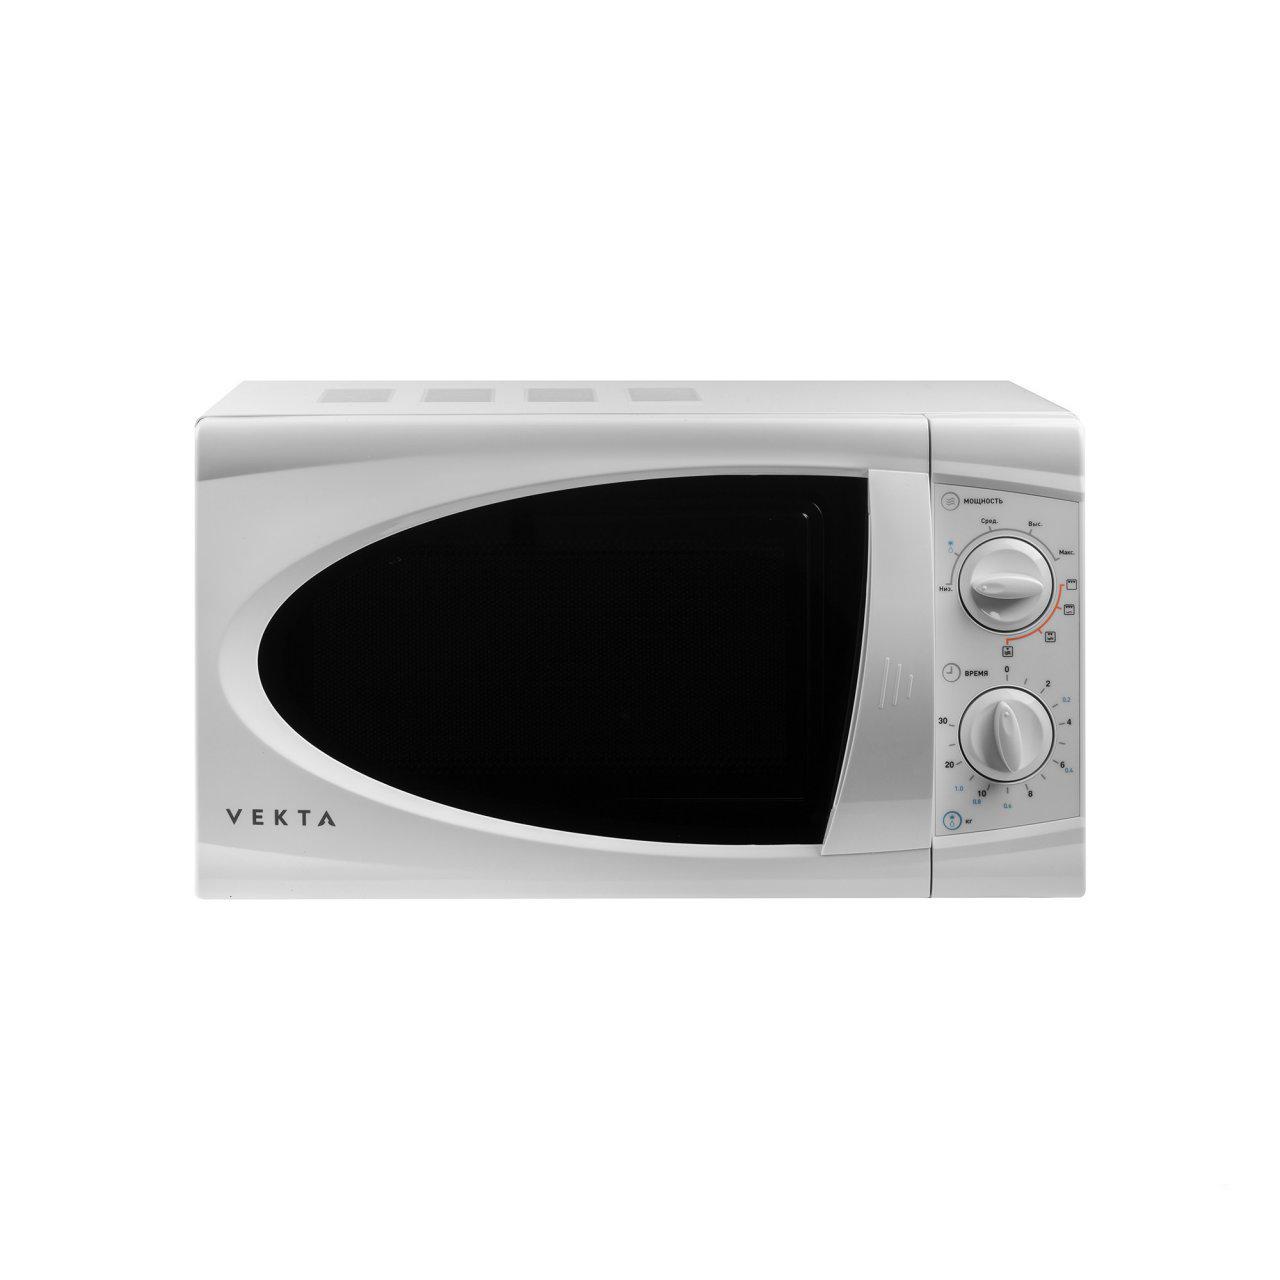 Микроволновая печь соло Vekta MG720ABW White